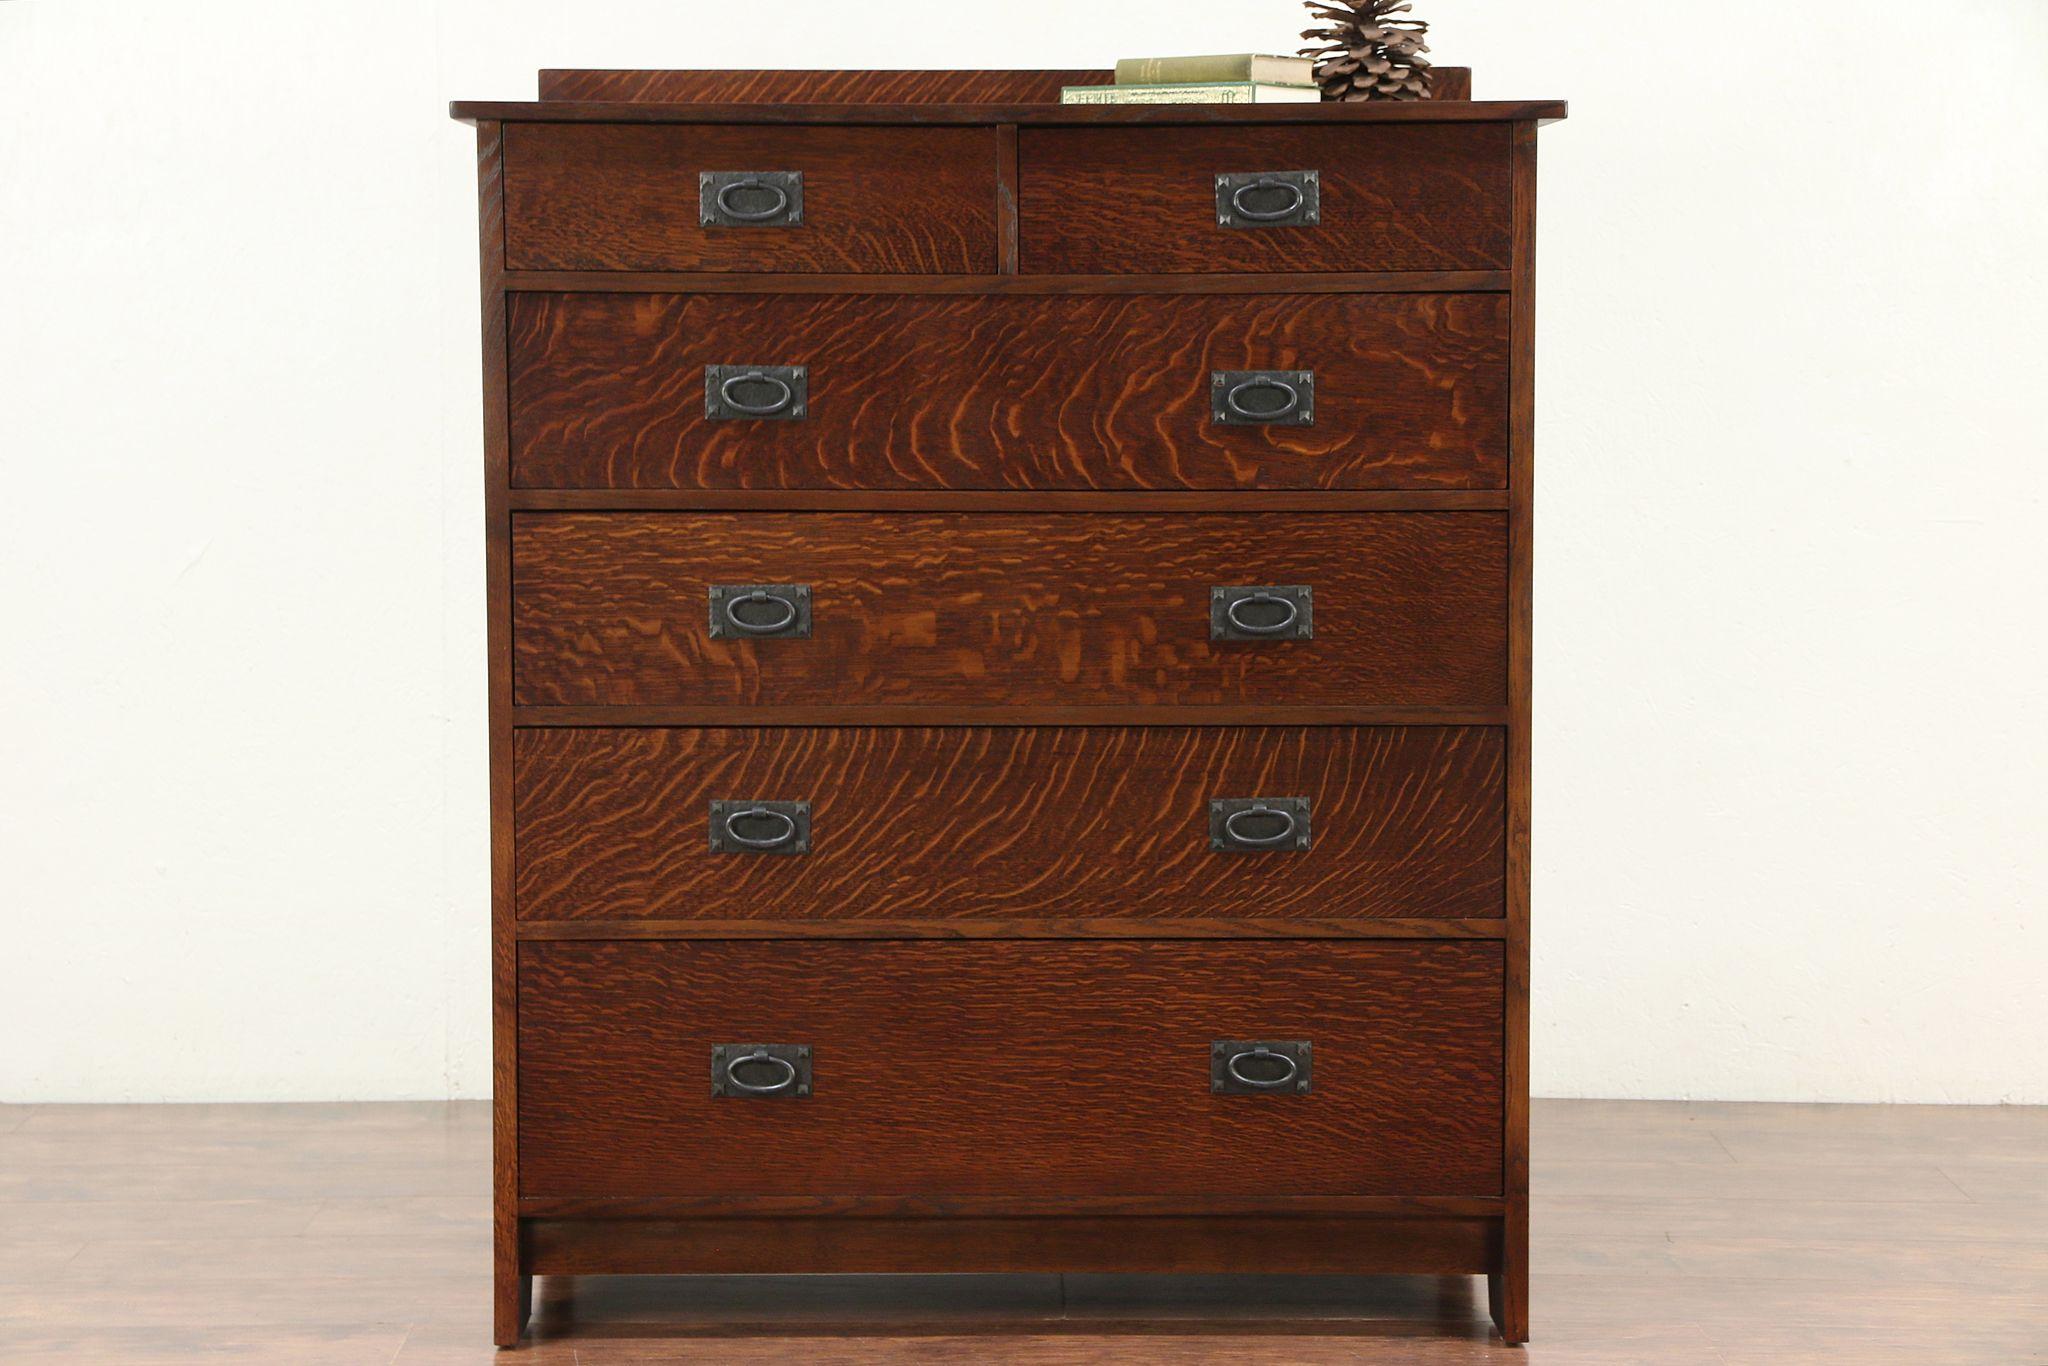 Art Crafts Mission Oak Craftsman Style Tall Chest Or Dresser 29483